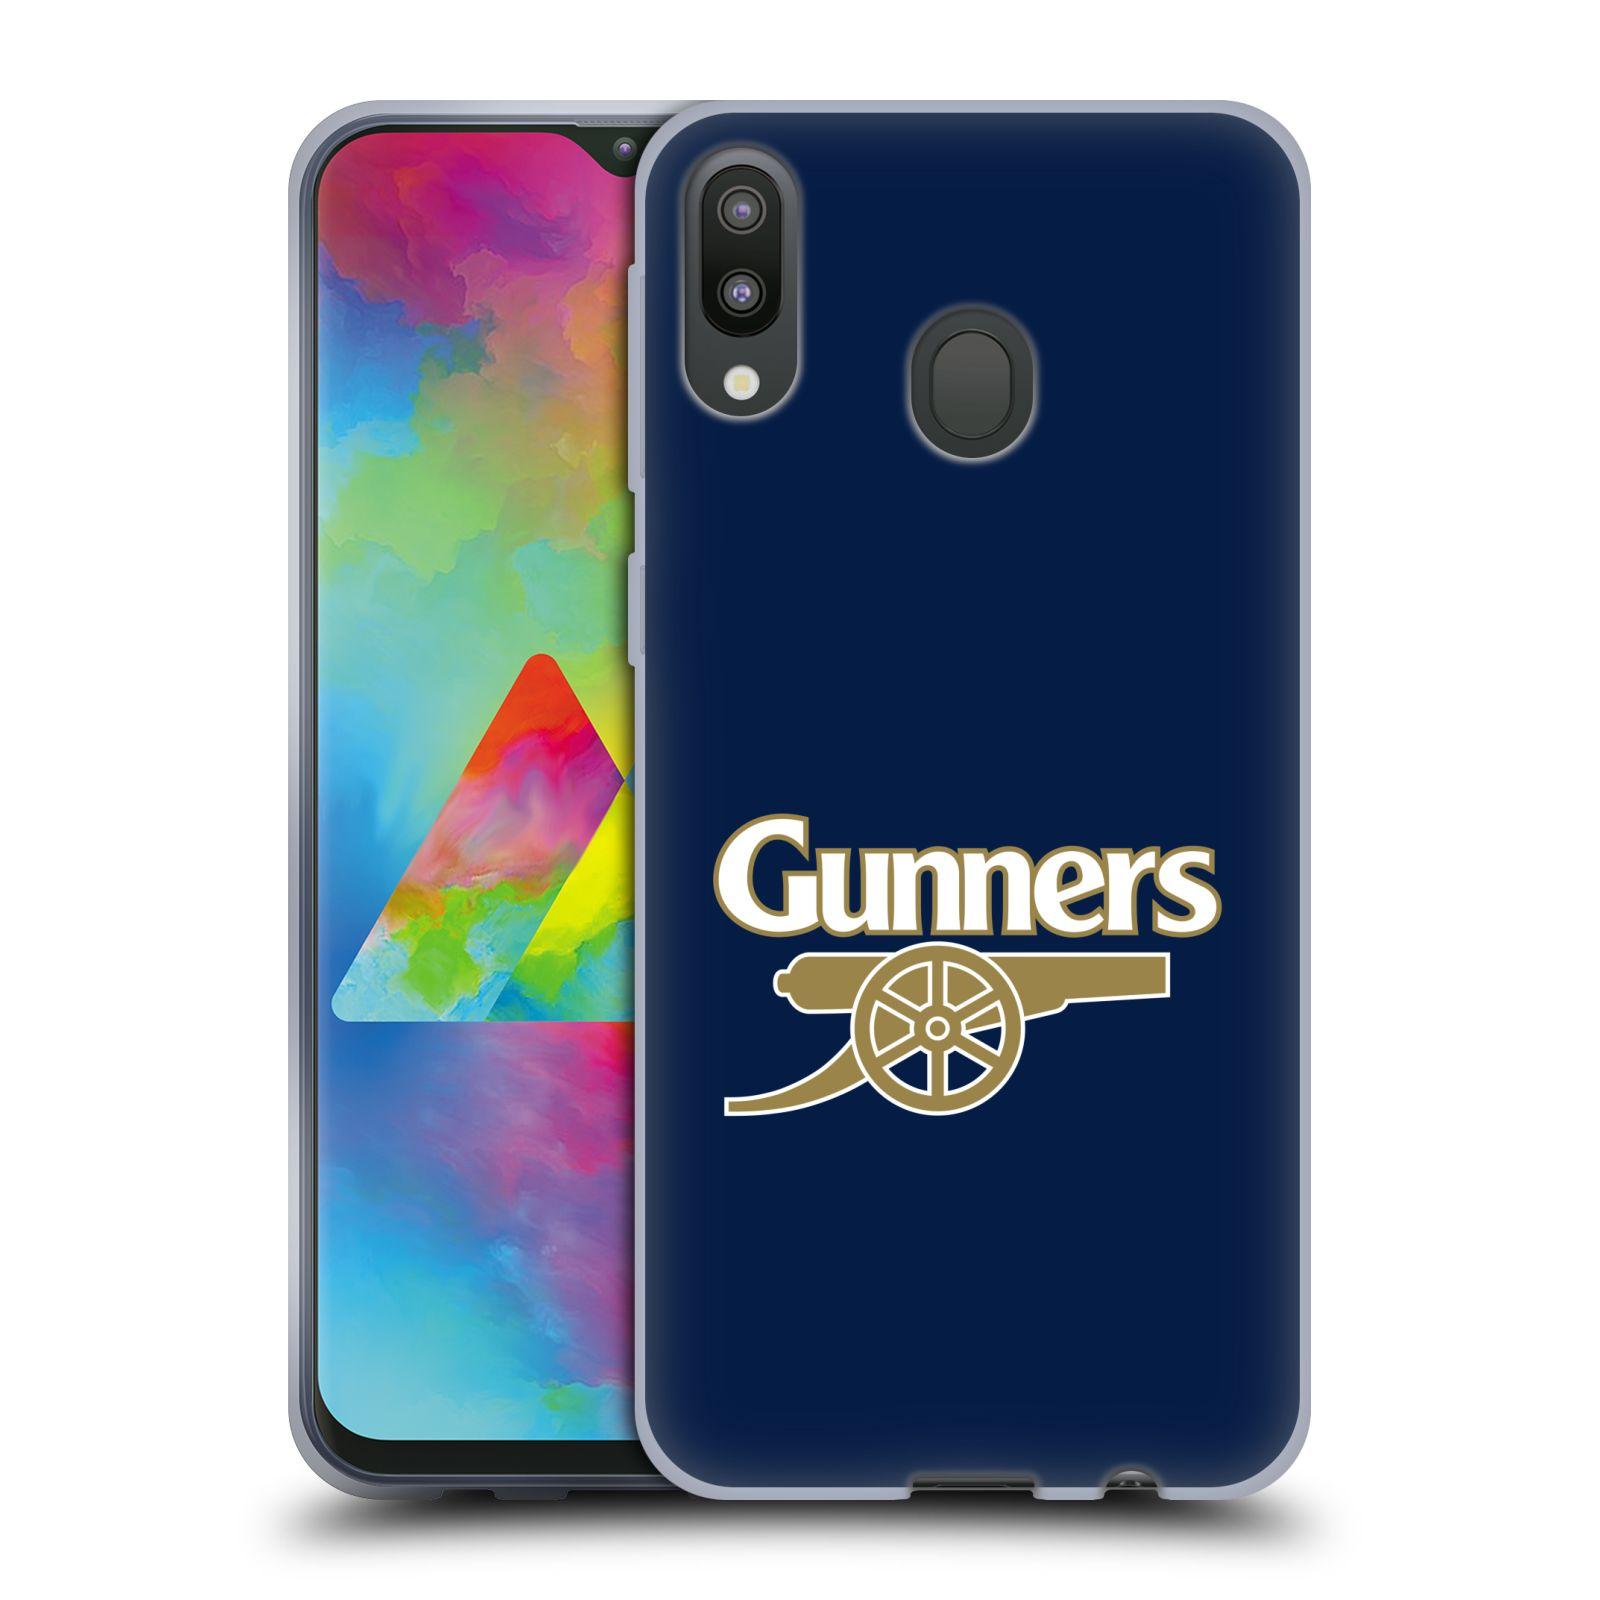 Silikonové pouzdro na mobil Samsung Galaxy M20 - Head Case - Arsenal FC - Gunners